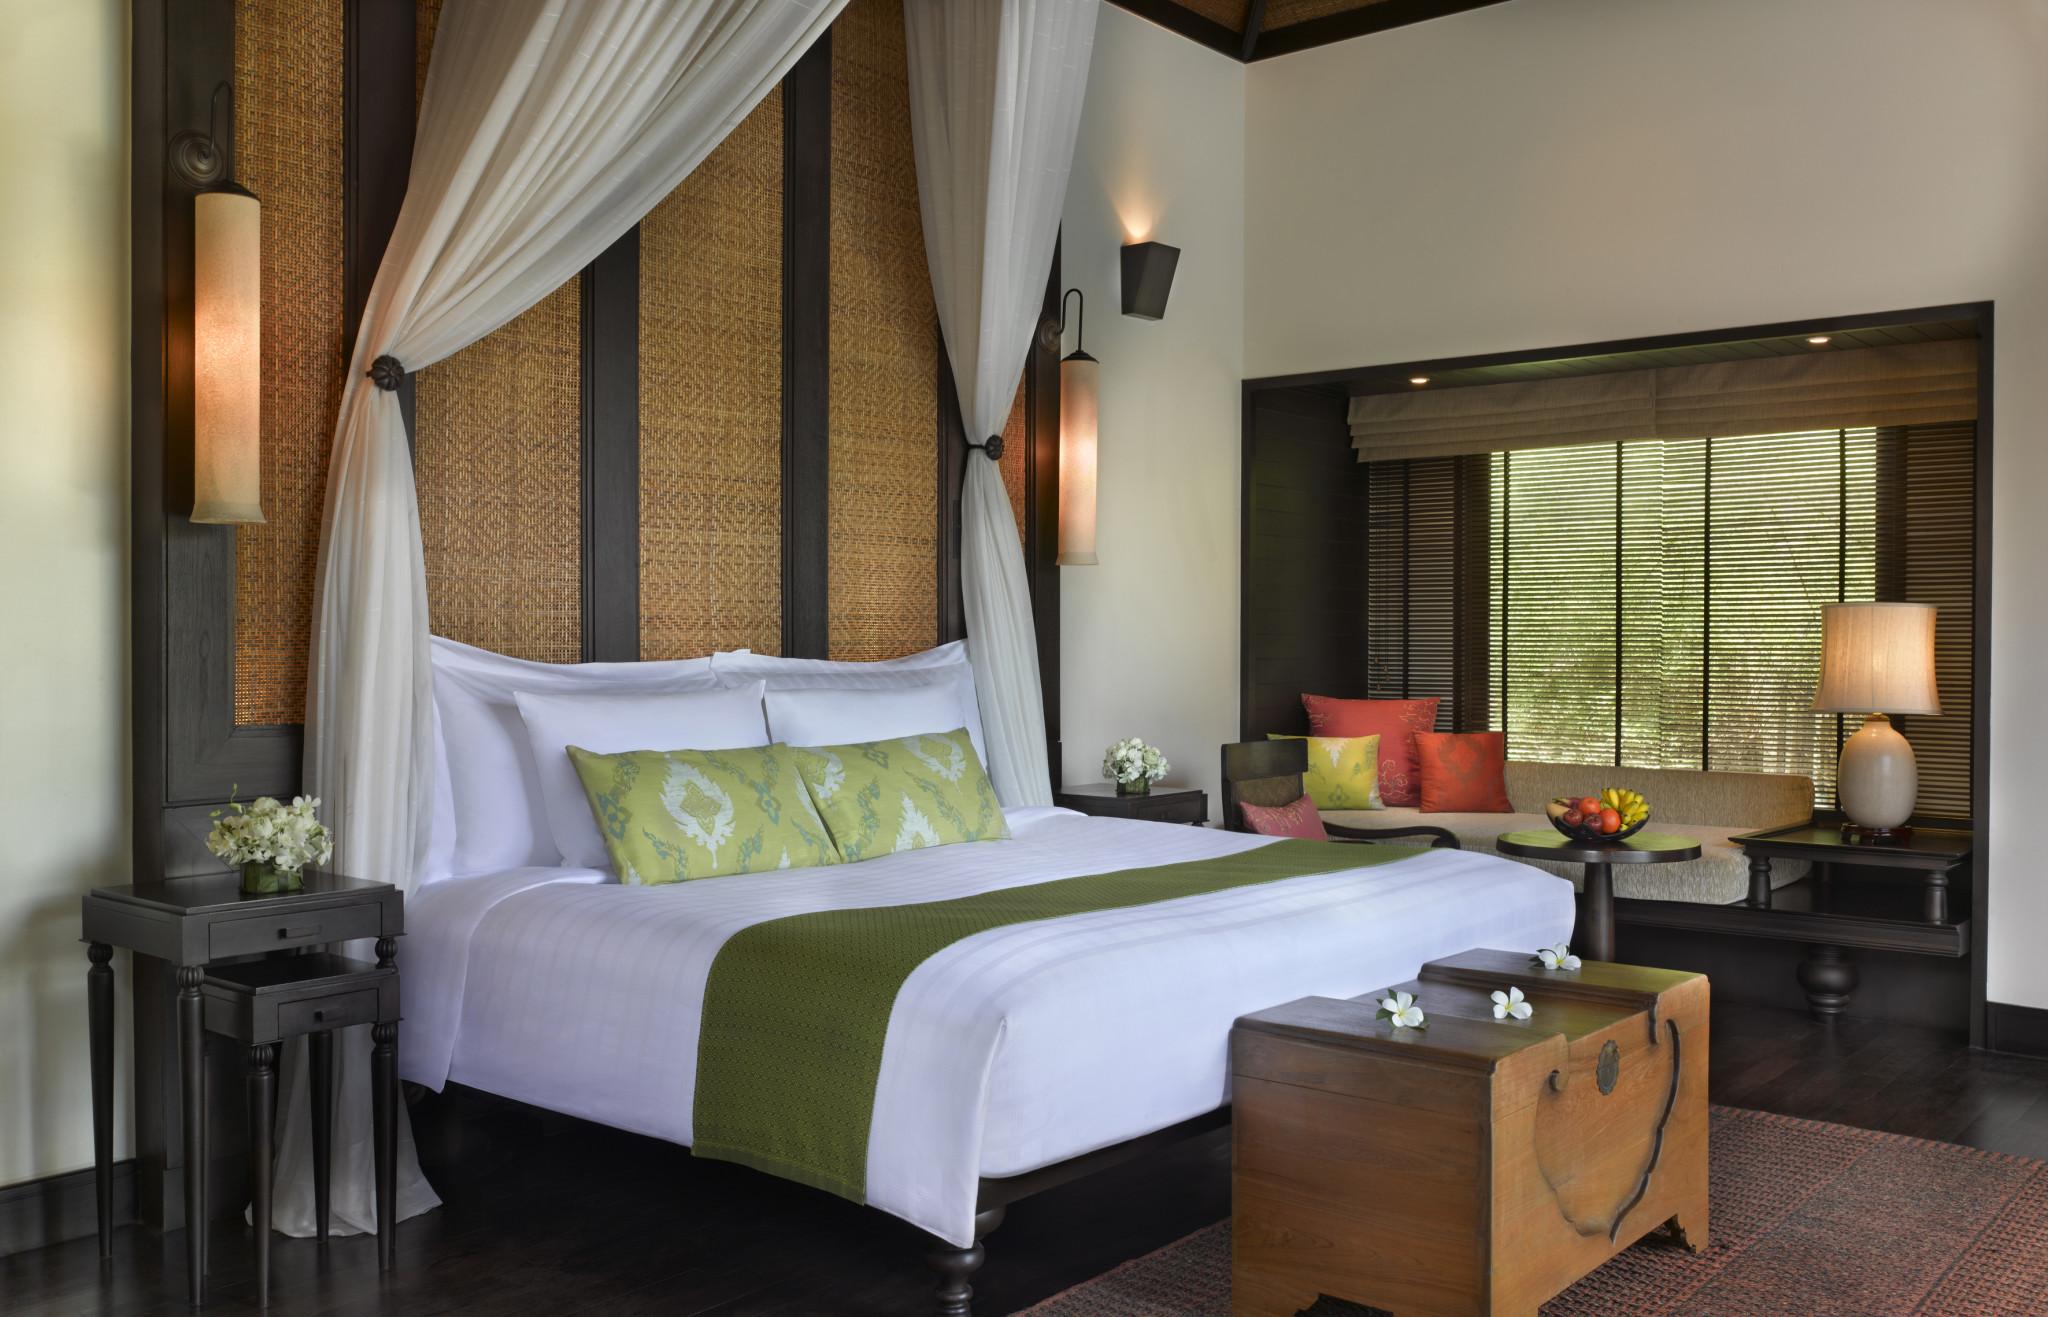 APK_47911765_Pool_Villa_bedroom